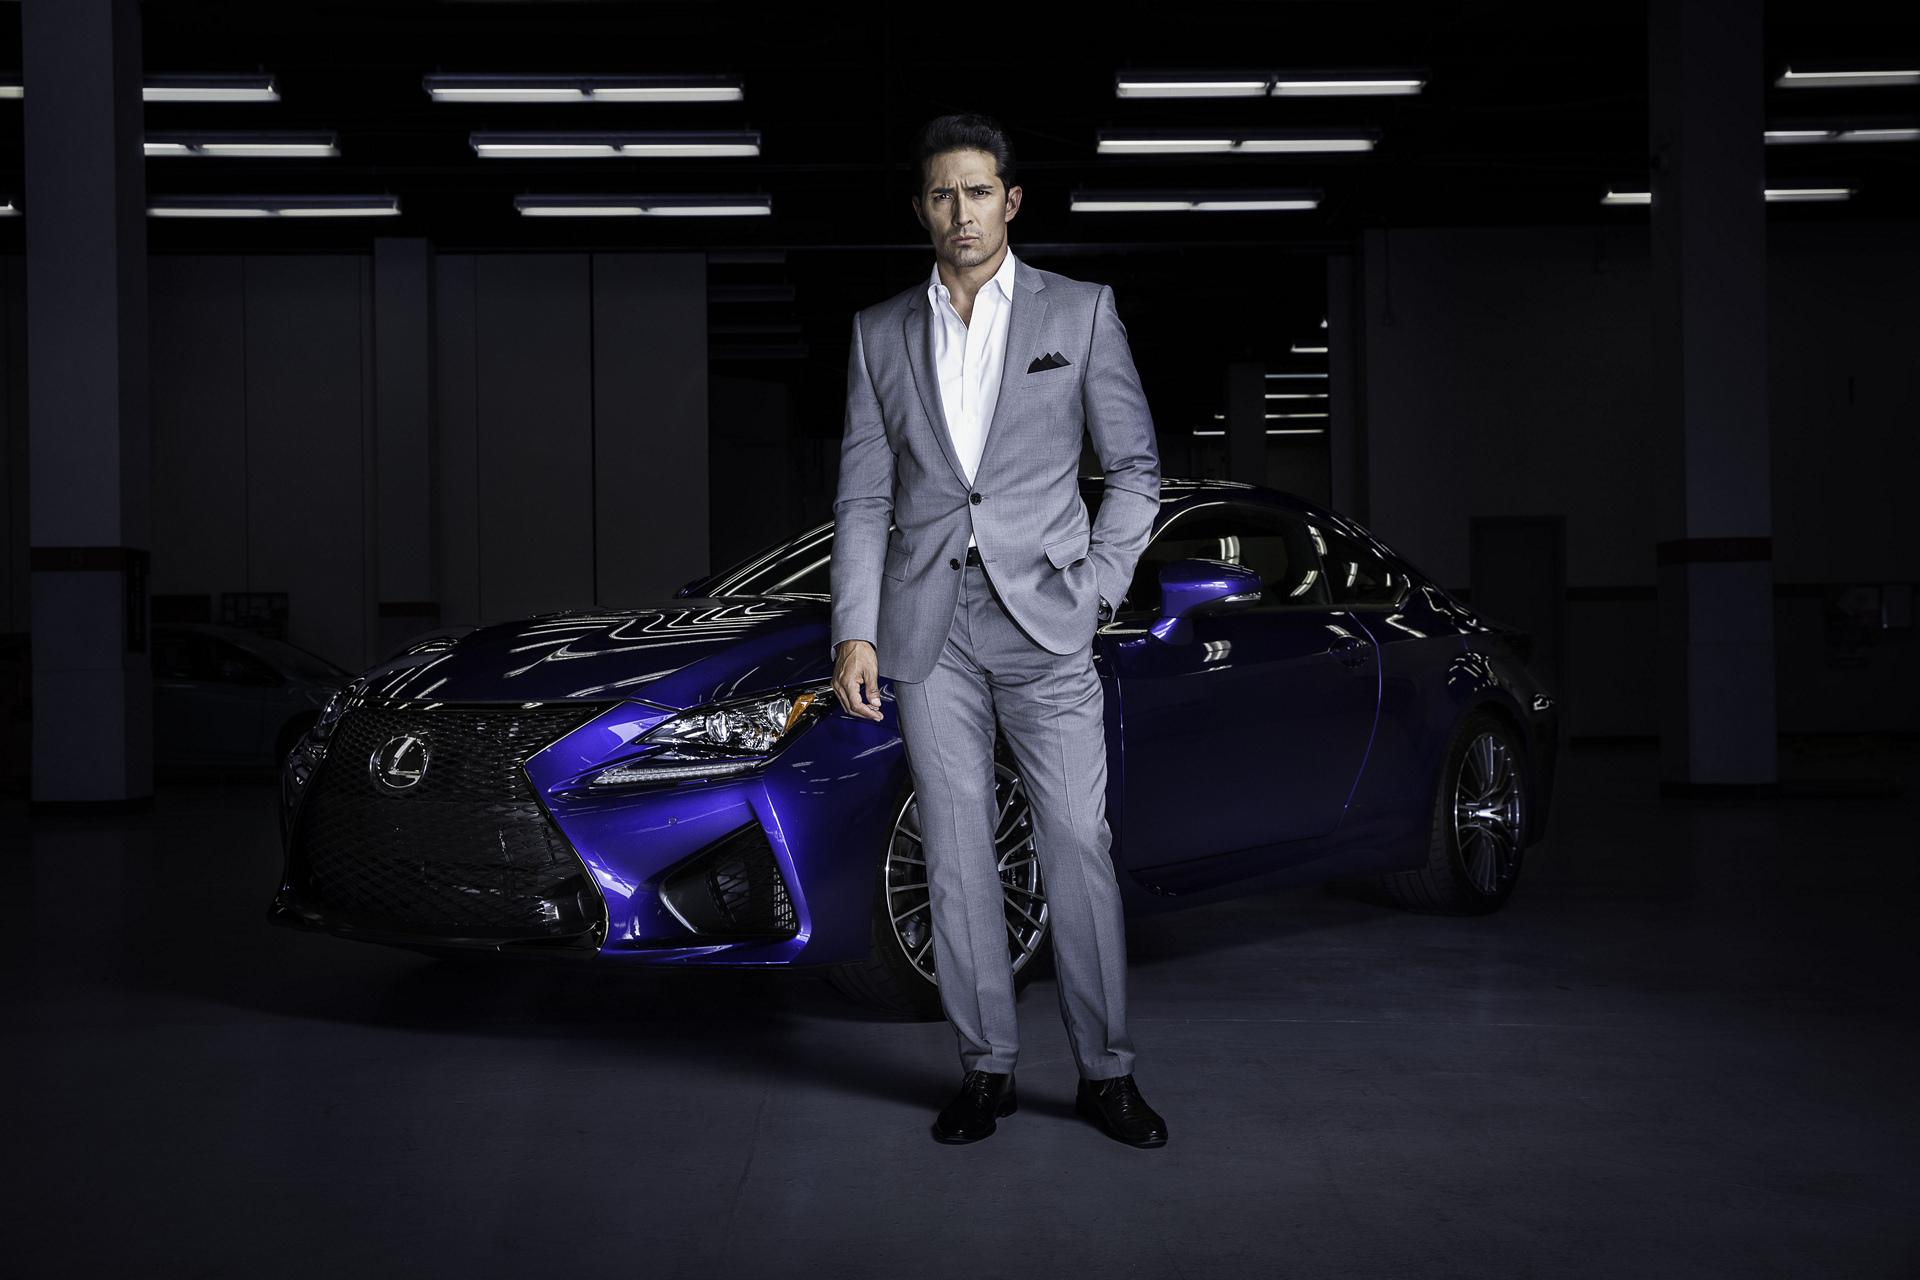 Lexus V-LCRO Technology © Toyota Motor Corporation